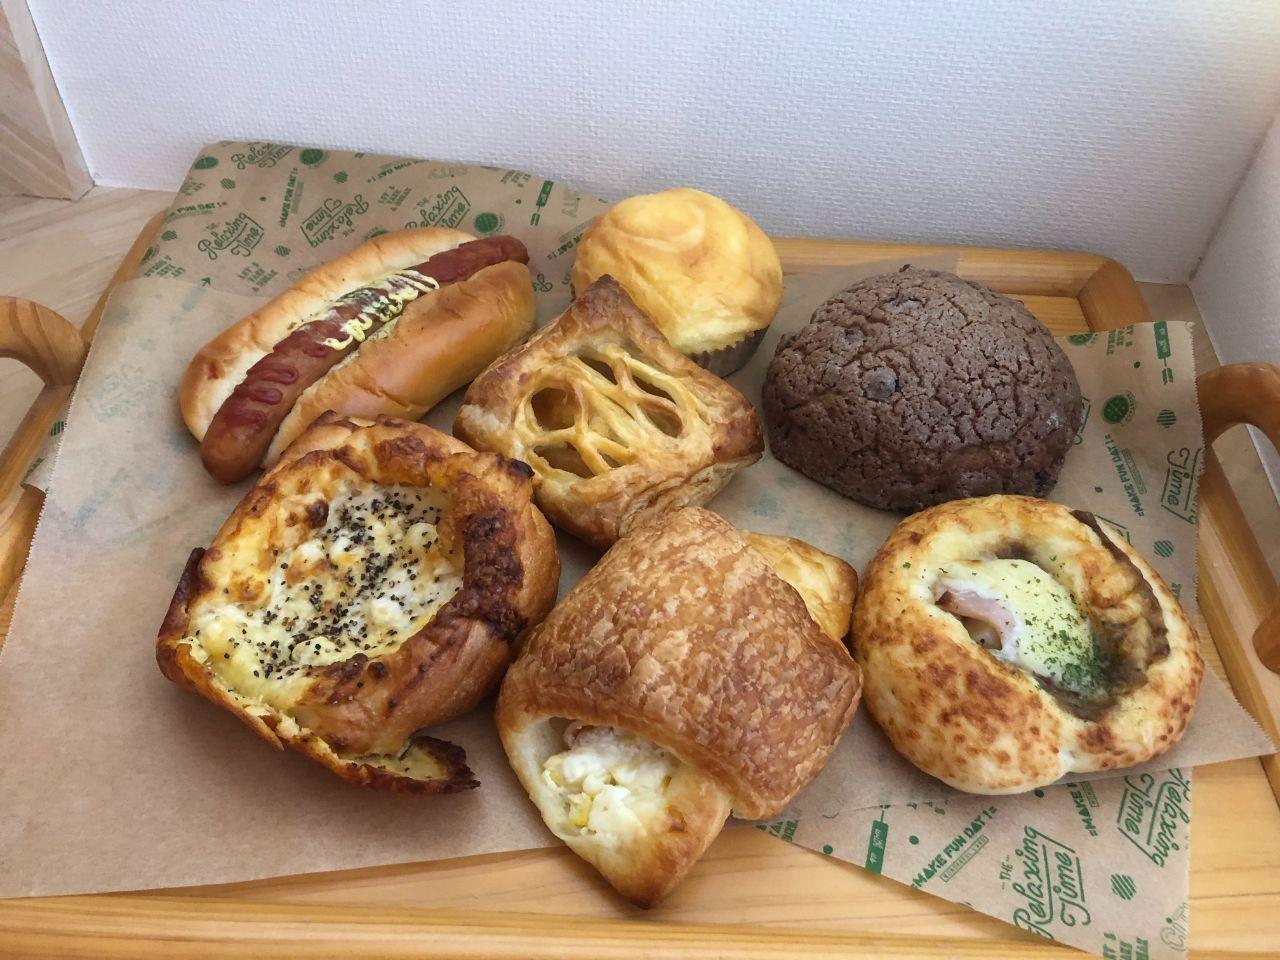 「TABETE」でレスキューしたパン